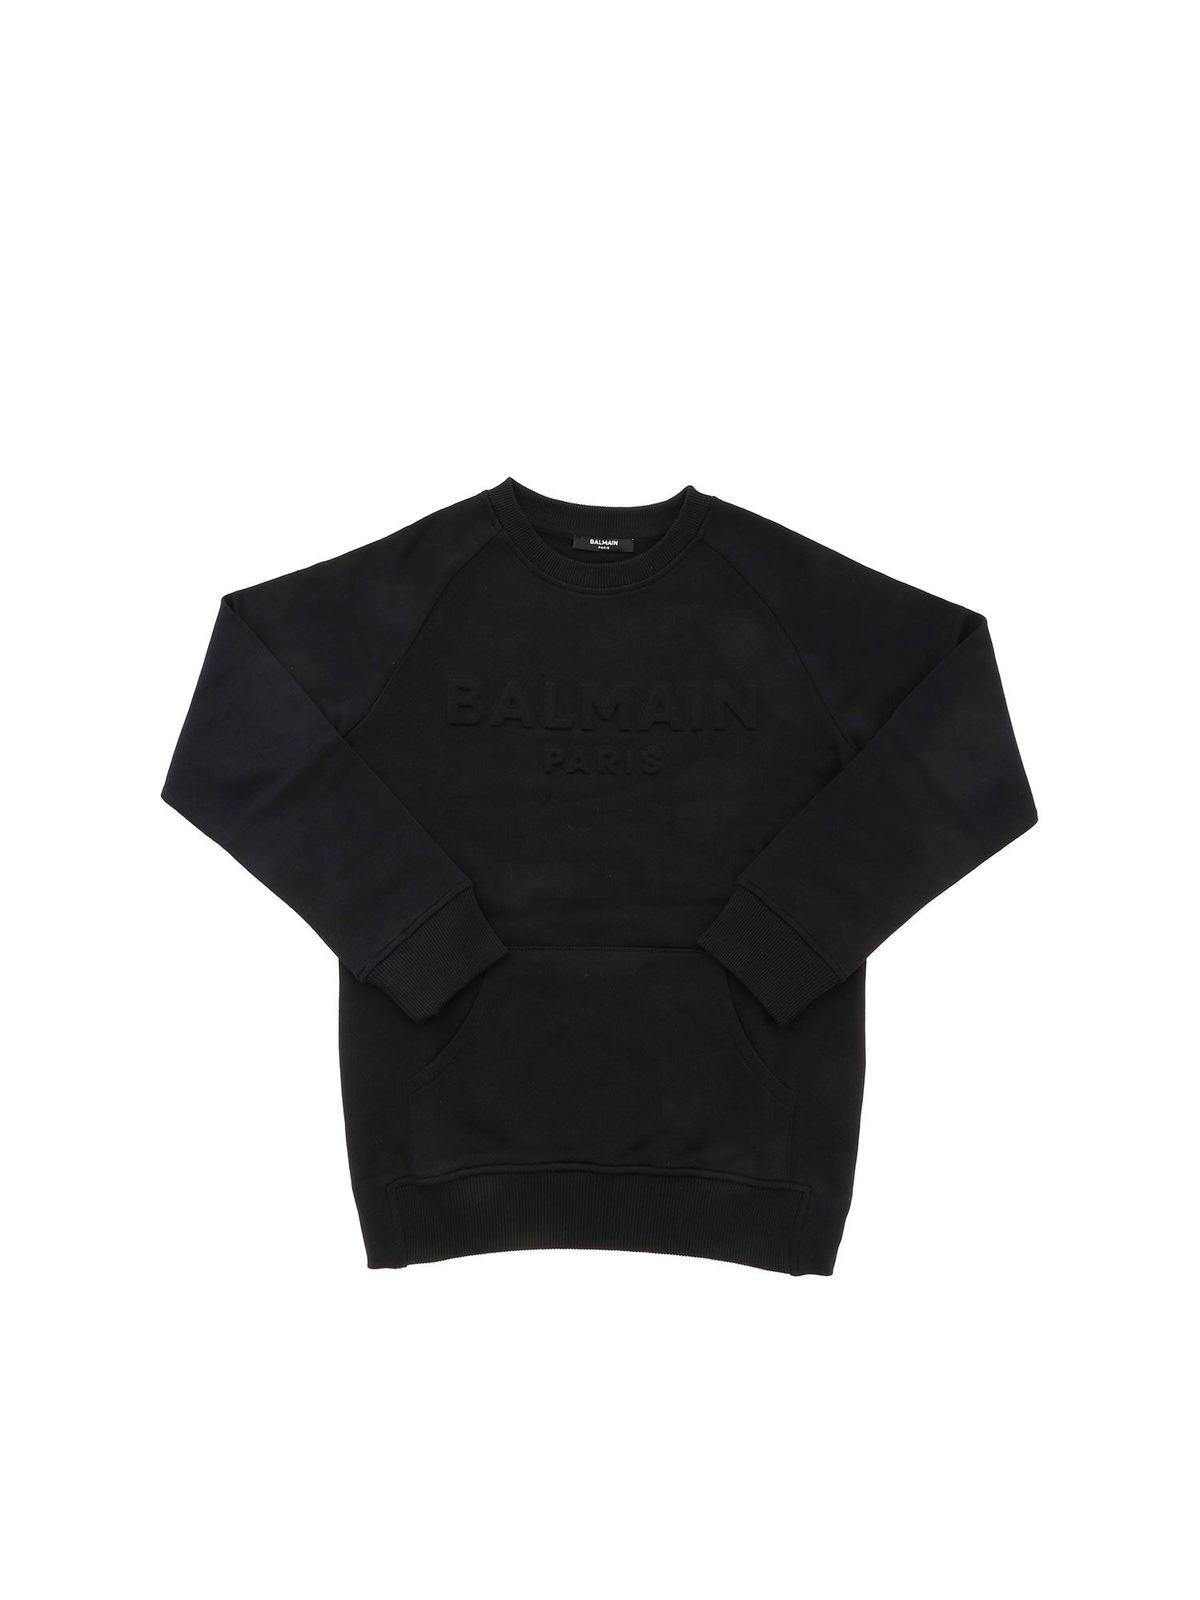 Balmain Cottons 3D LOGO SWEATSHIRT IN BLACK